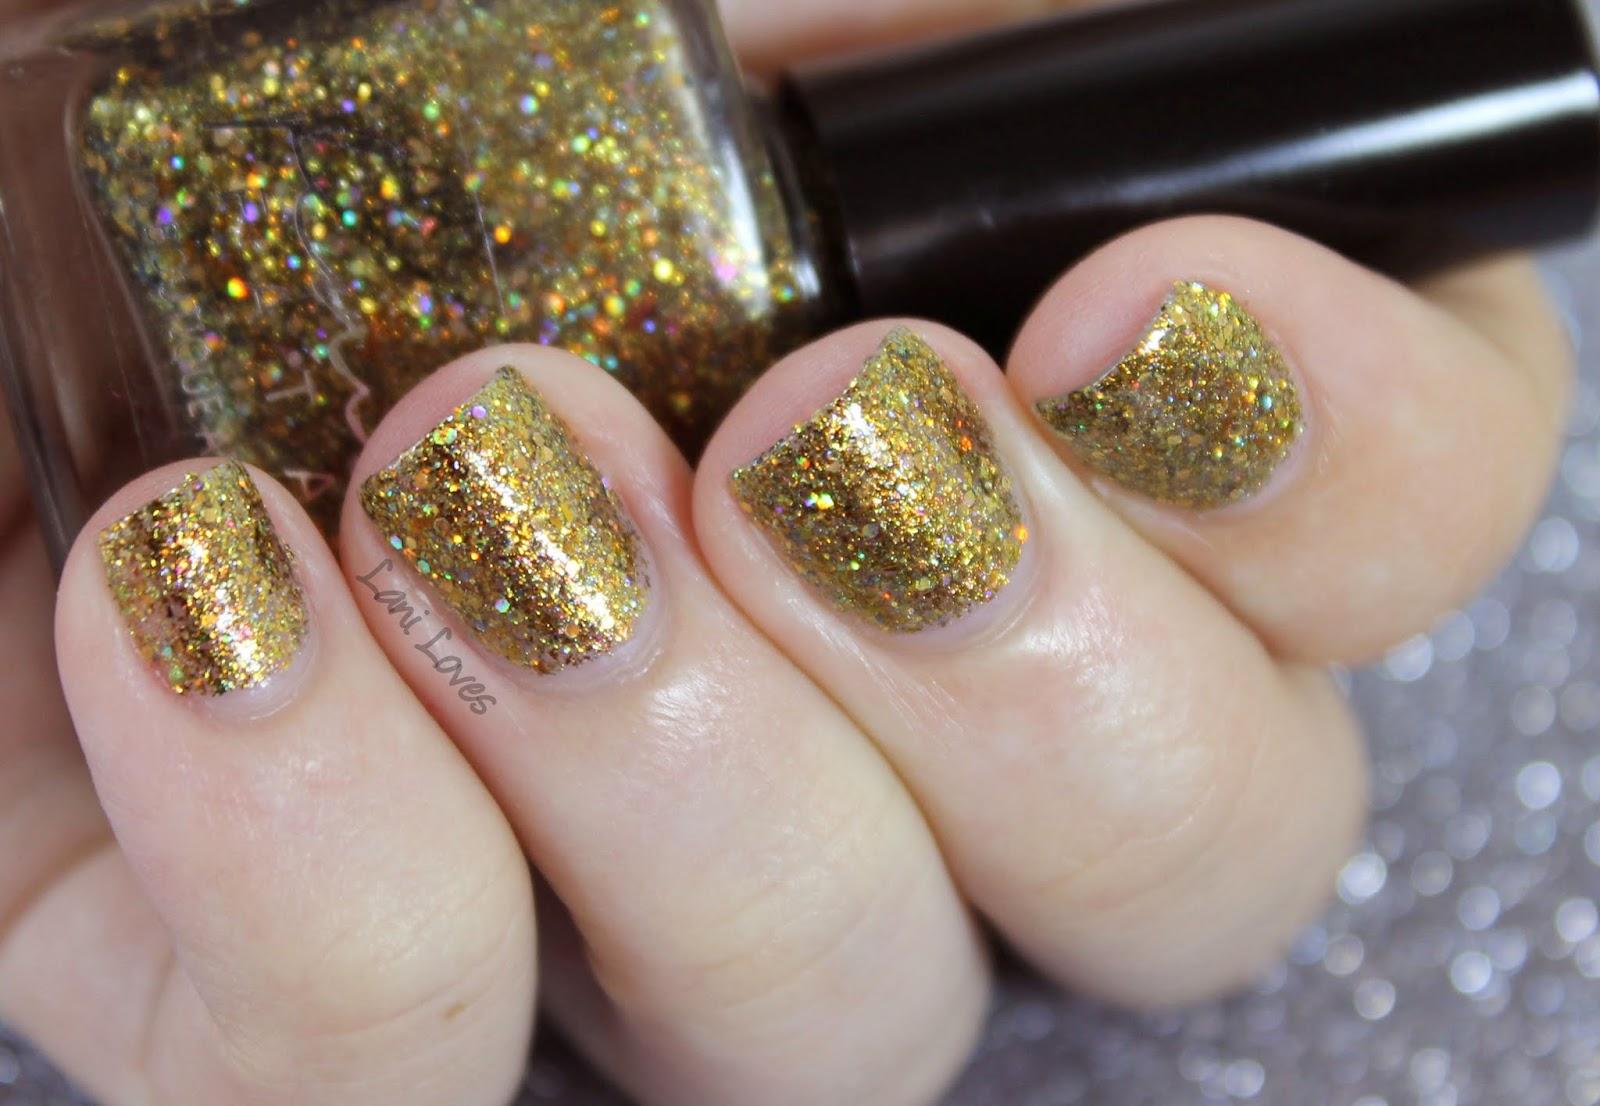 Femme Fatale Cosmetics - Fool's Paradise nail polish swatch